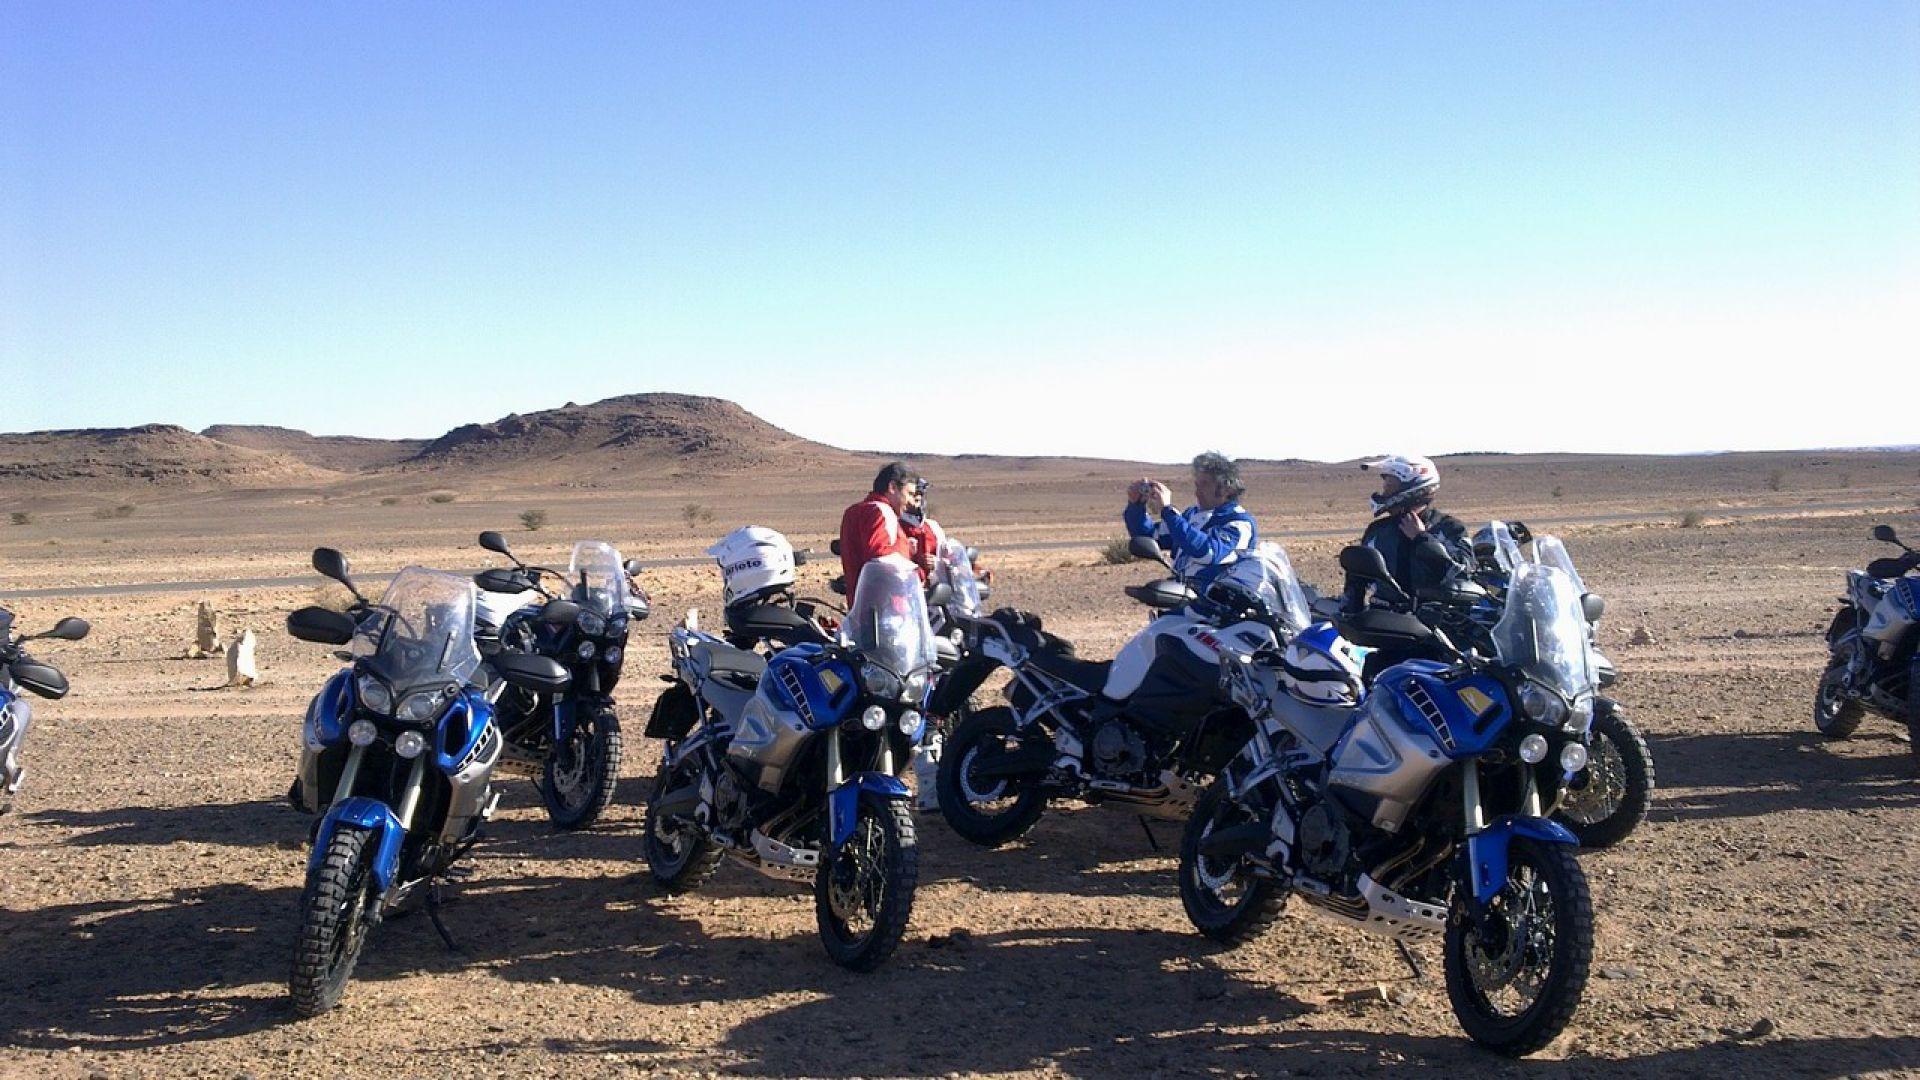 Immagine 155: In Marocco con la Yamaha Super Ténéré